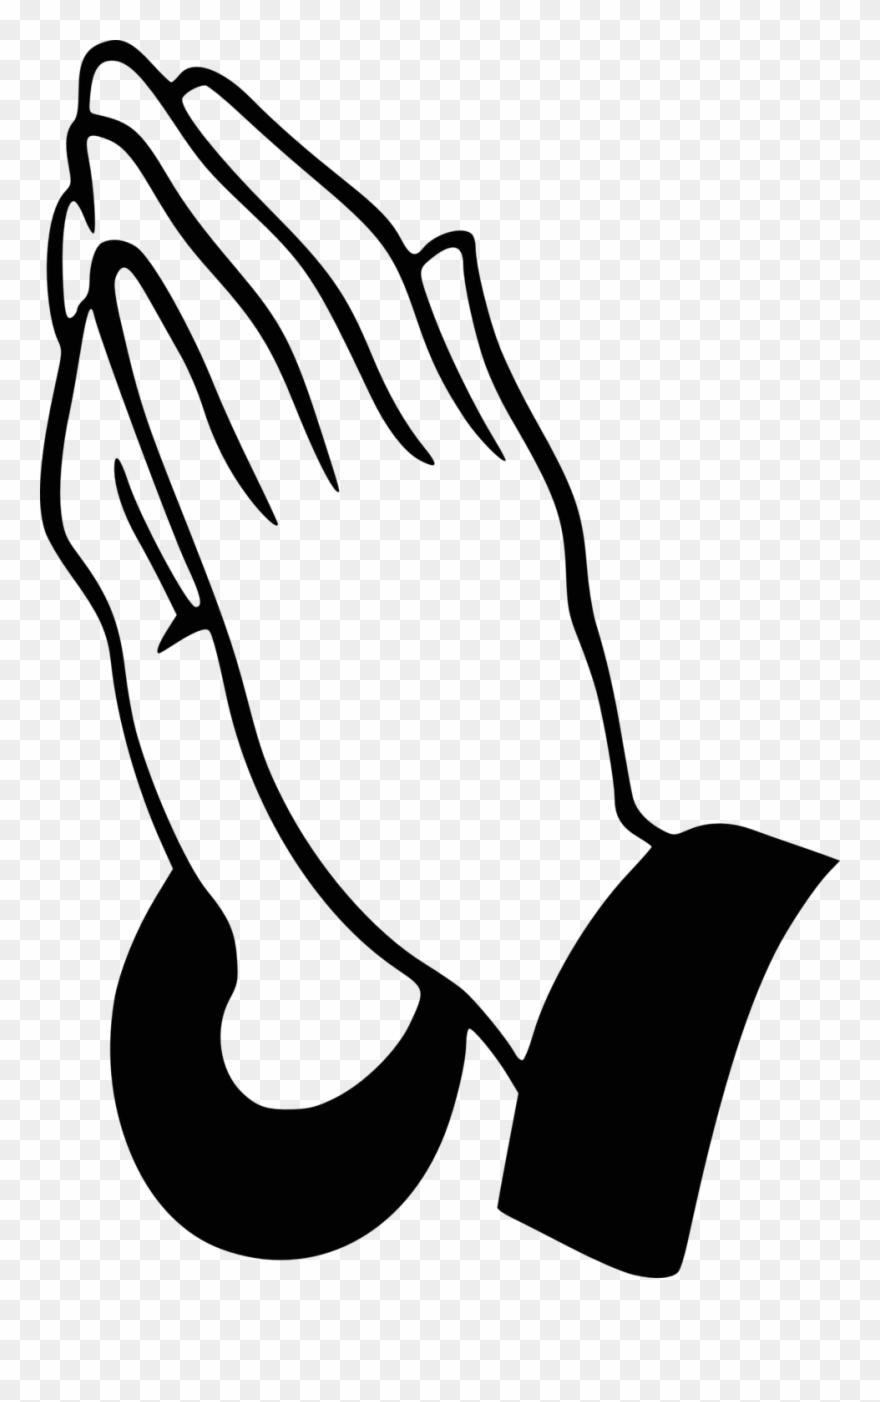 Baseball Clipart Errortape Free Clipart Prayer Hands